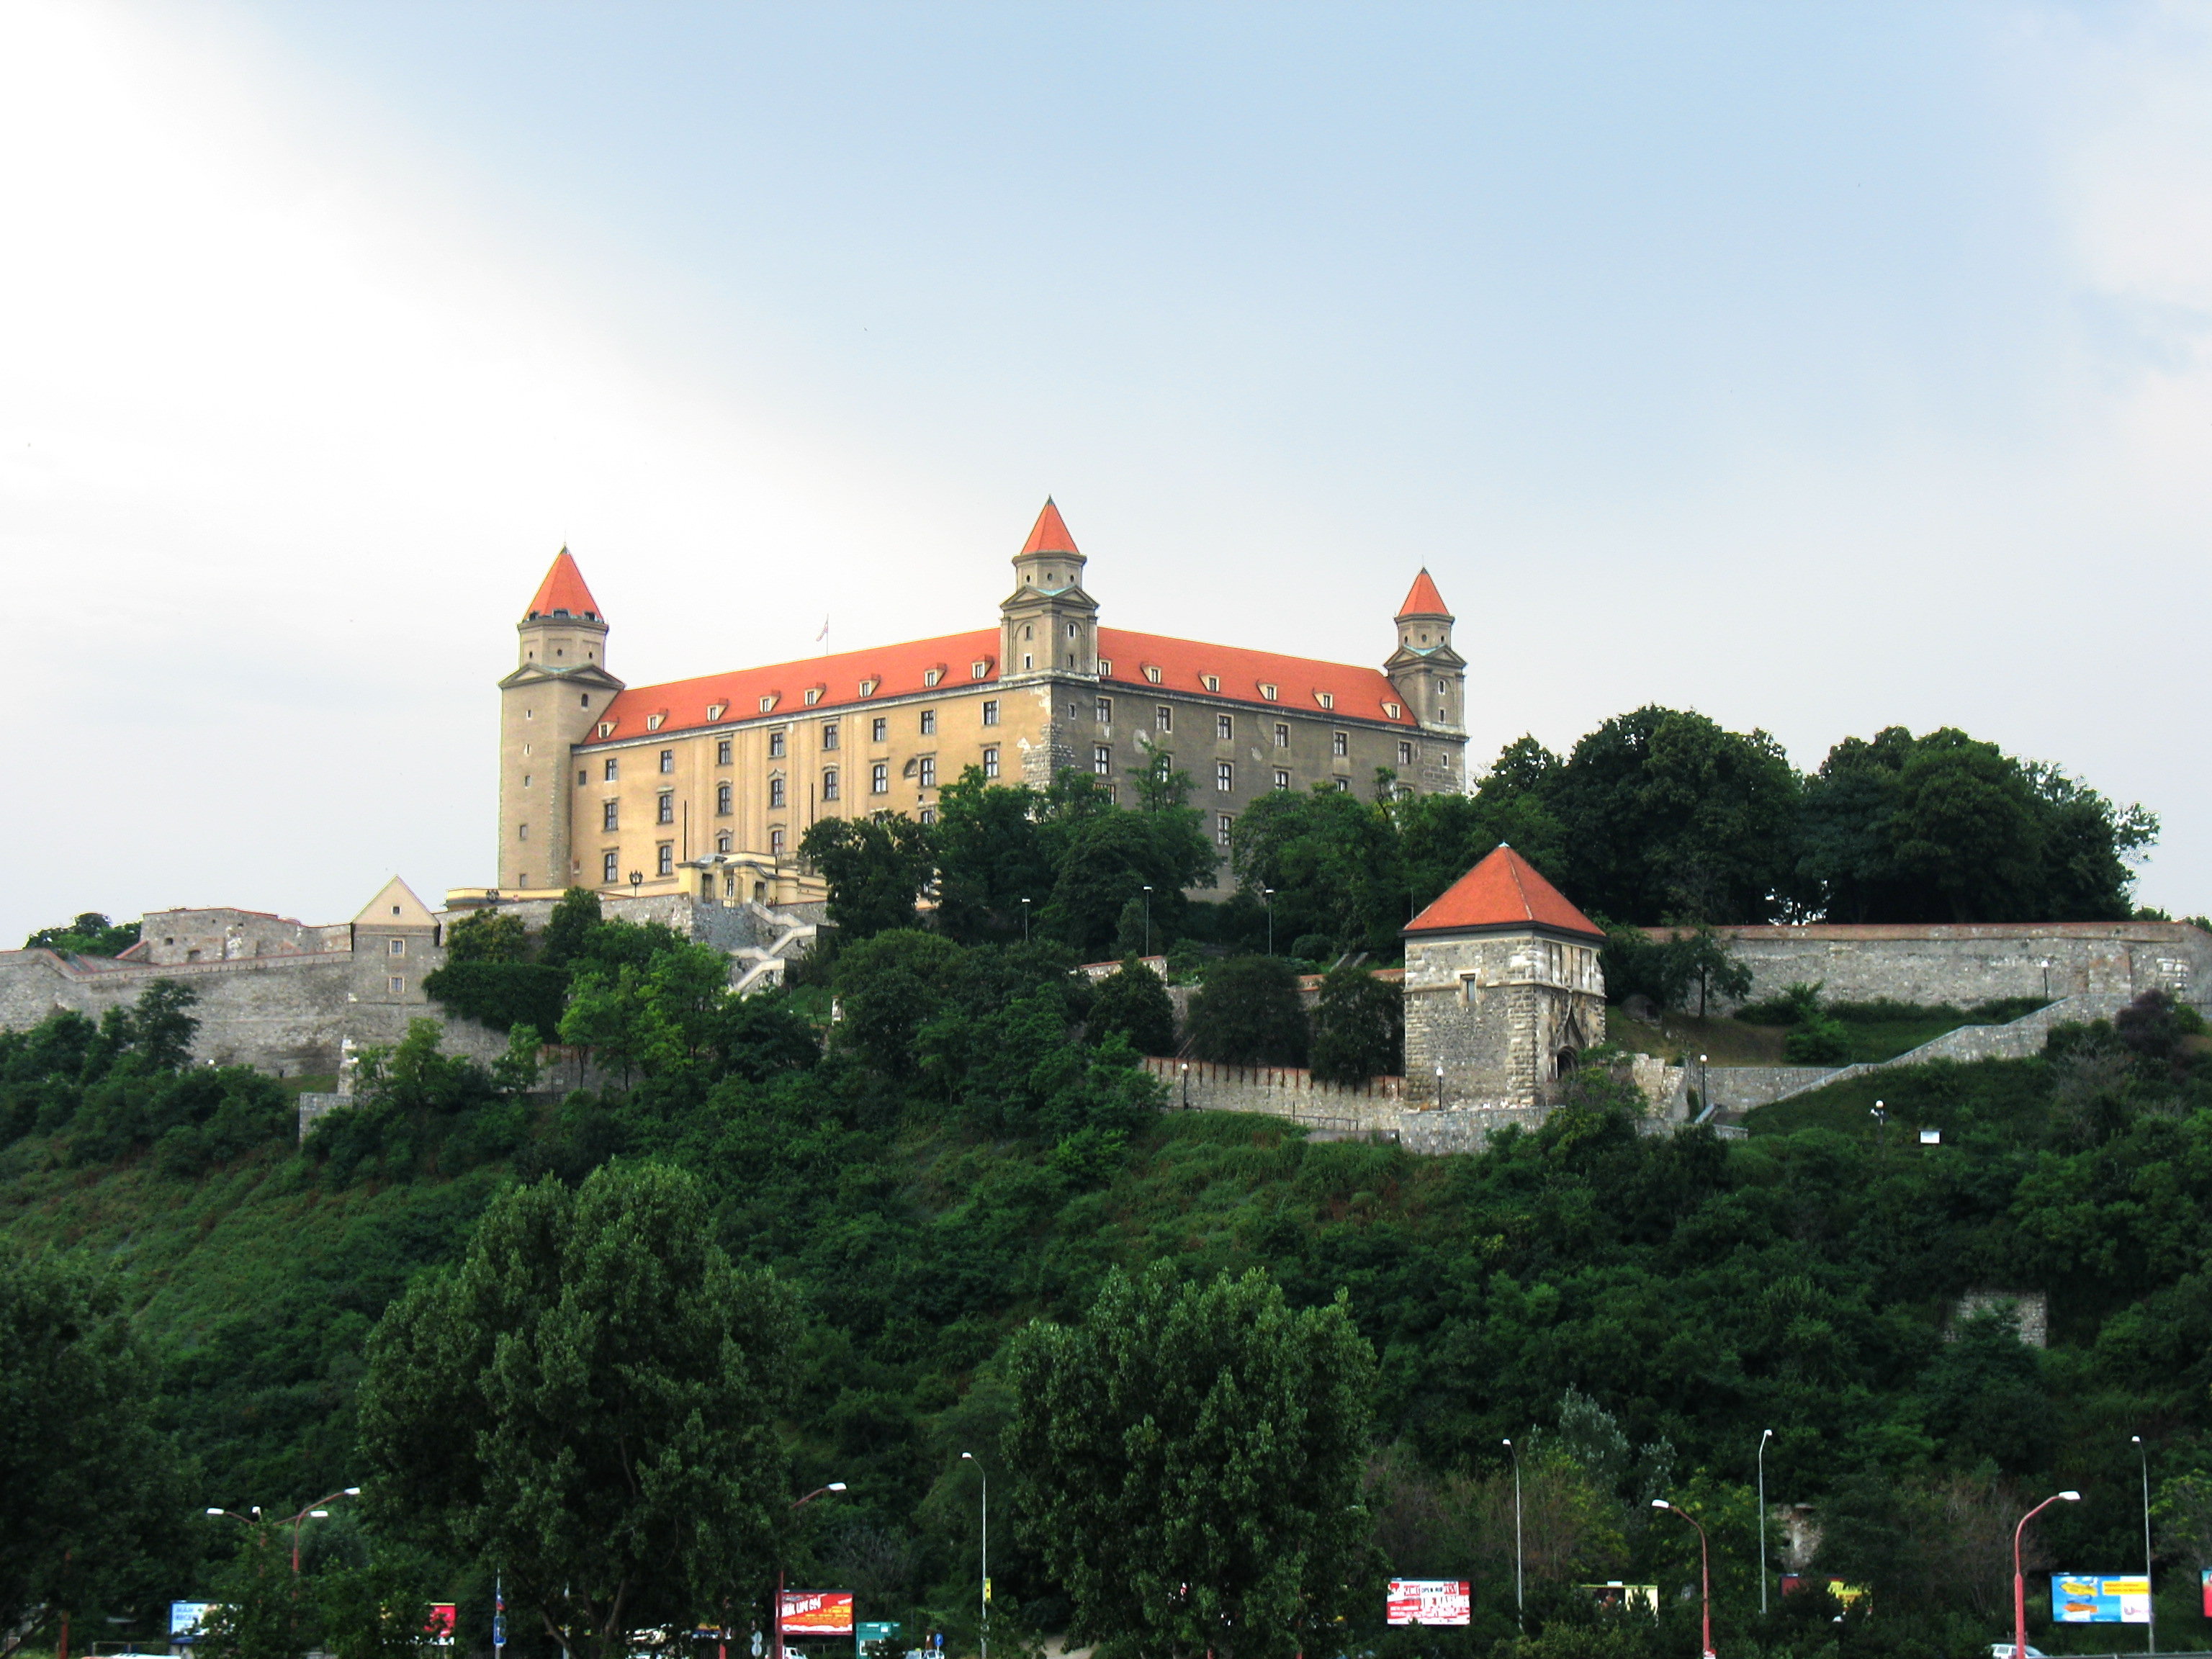 http://upload.wikimedia.org/wikipedia/commons/4/49/Bratislavsky_hrad.JPG